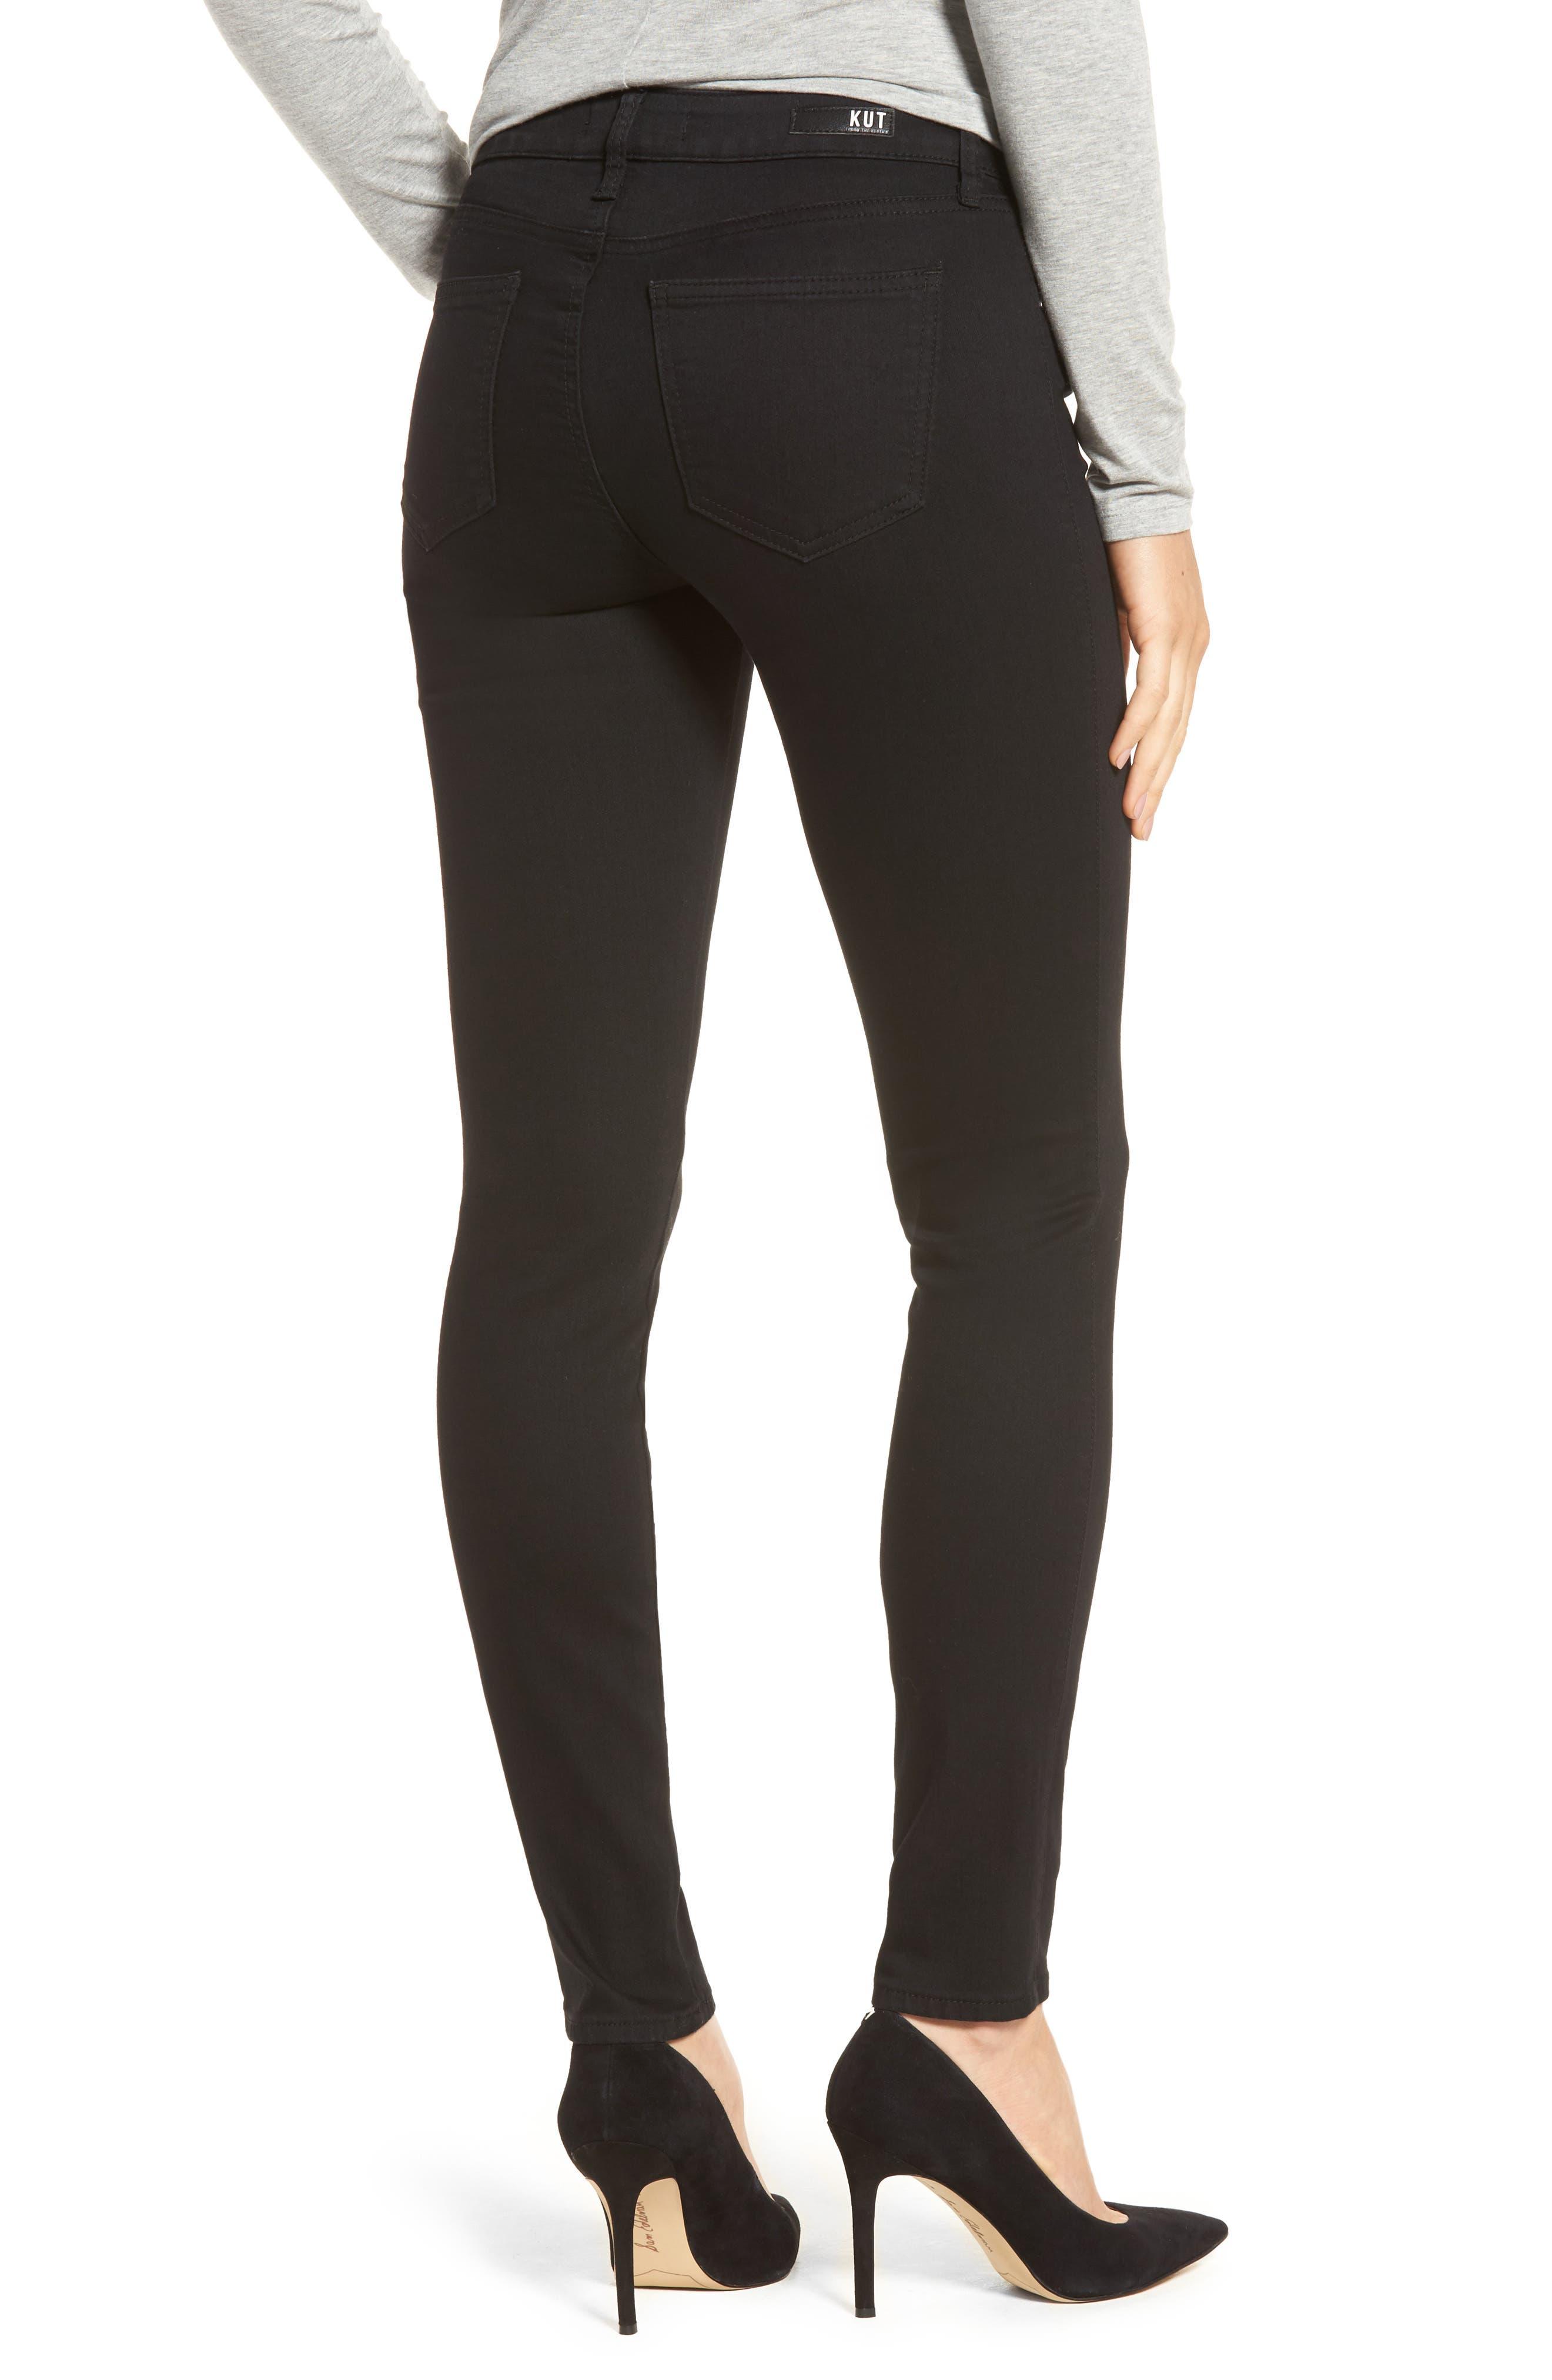 Diana Curvy Fit Skinny Jeans,                             Alternate thumbnail 2, color,                             Black